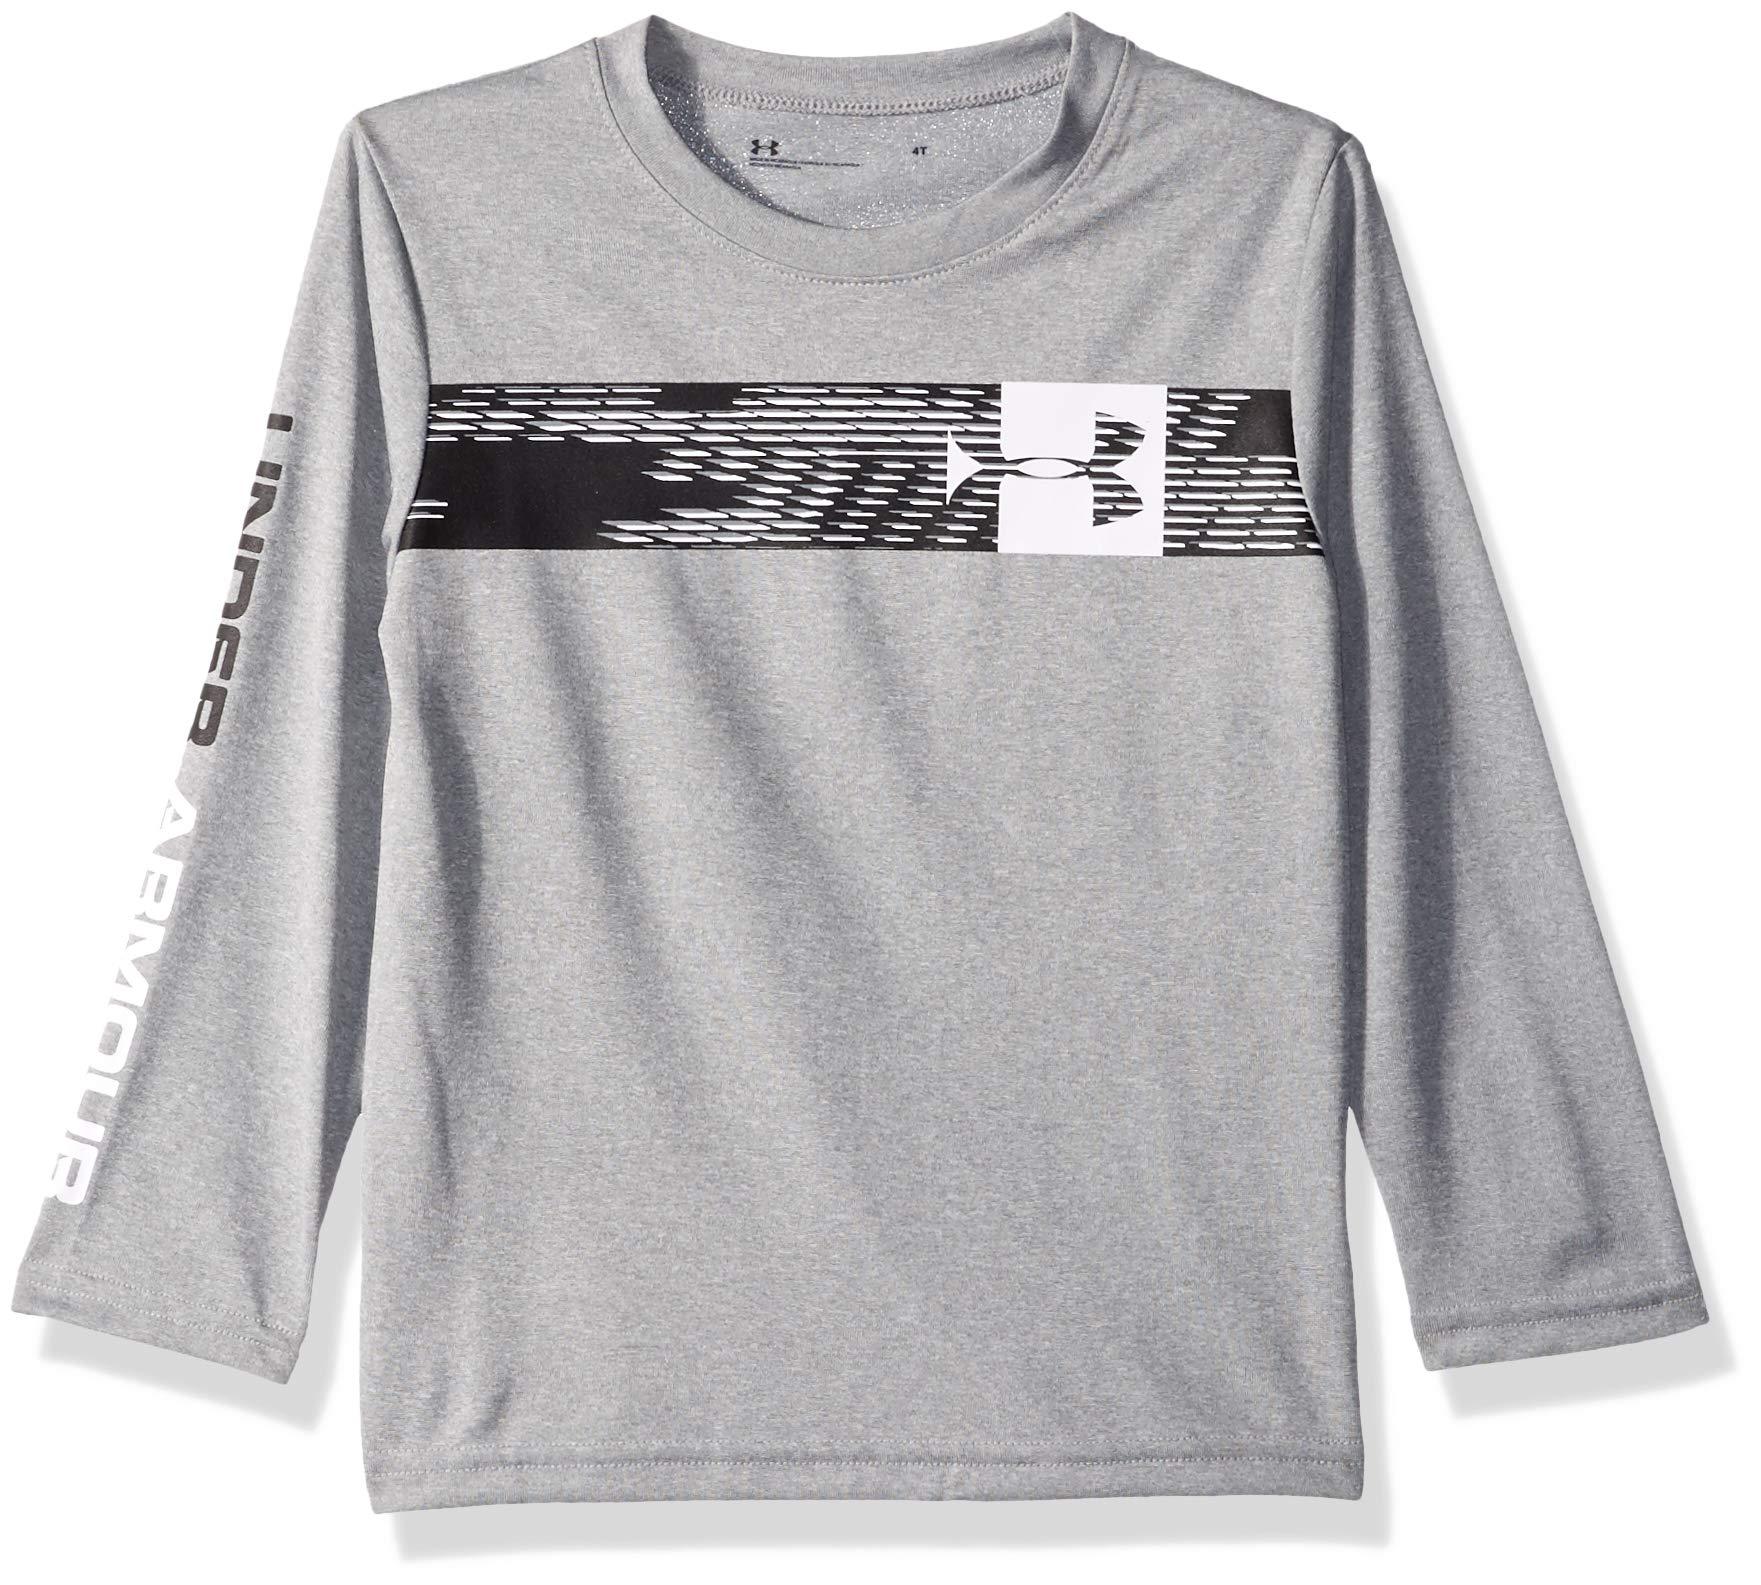 Under Armour Boys' Little Long Sleeve Graphic Tee Shirt, Travel True Grey Heather, 4